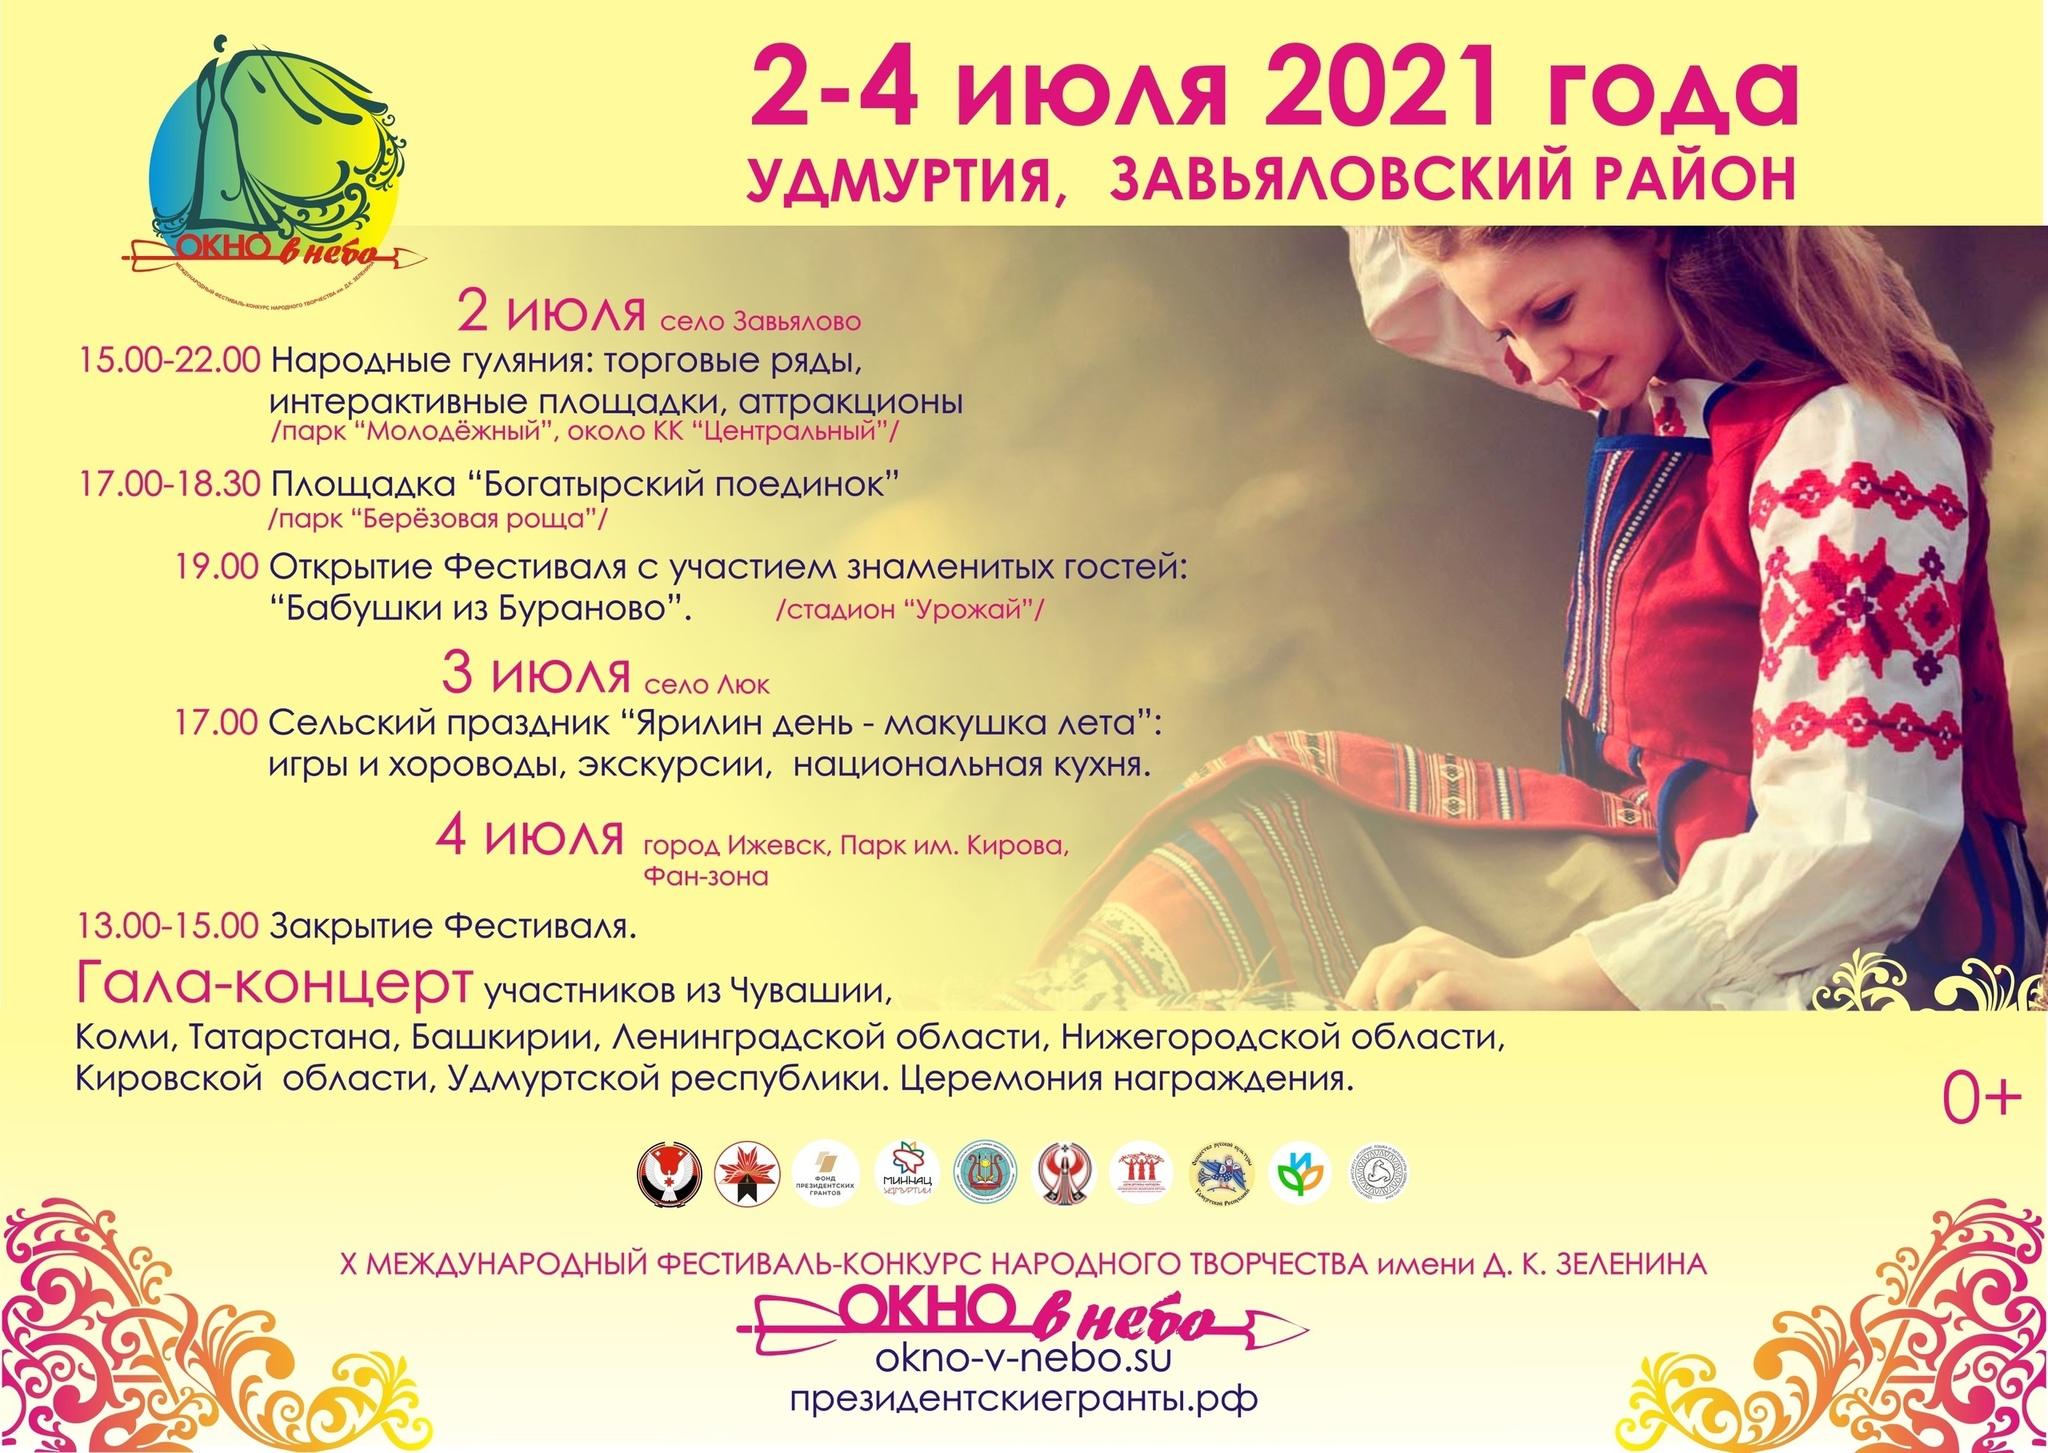 Фестиваль-конкурс народного творчества «Окно в небо»